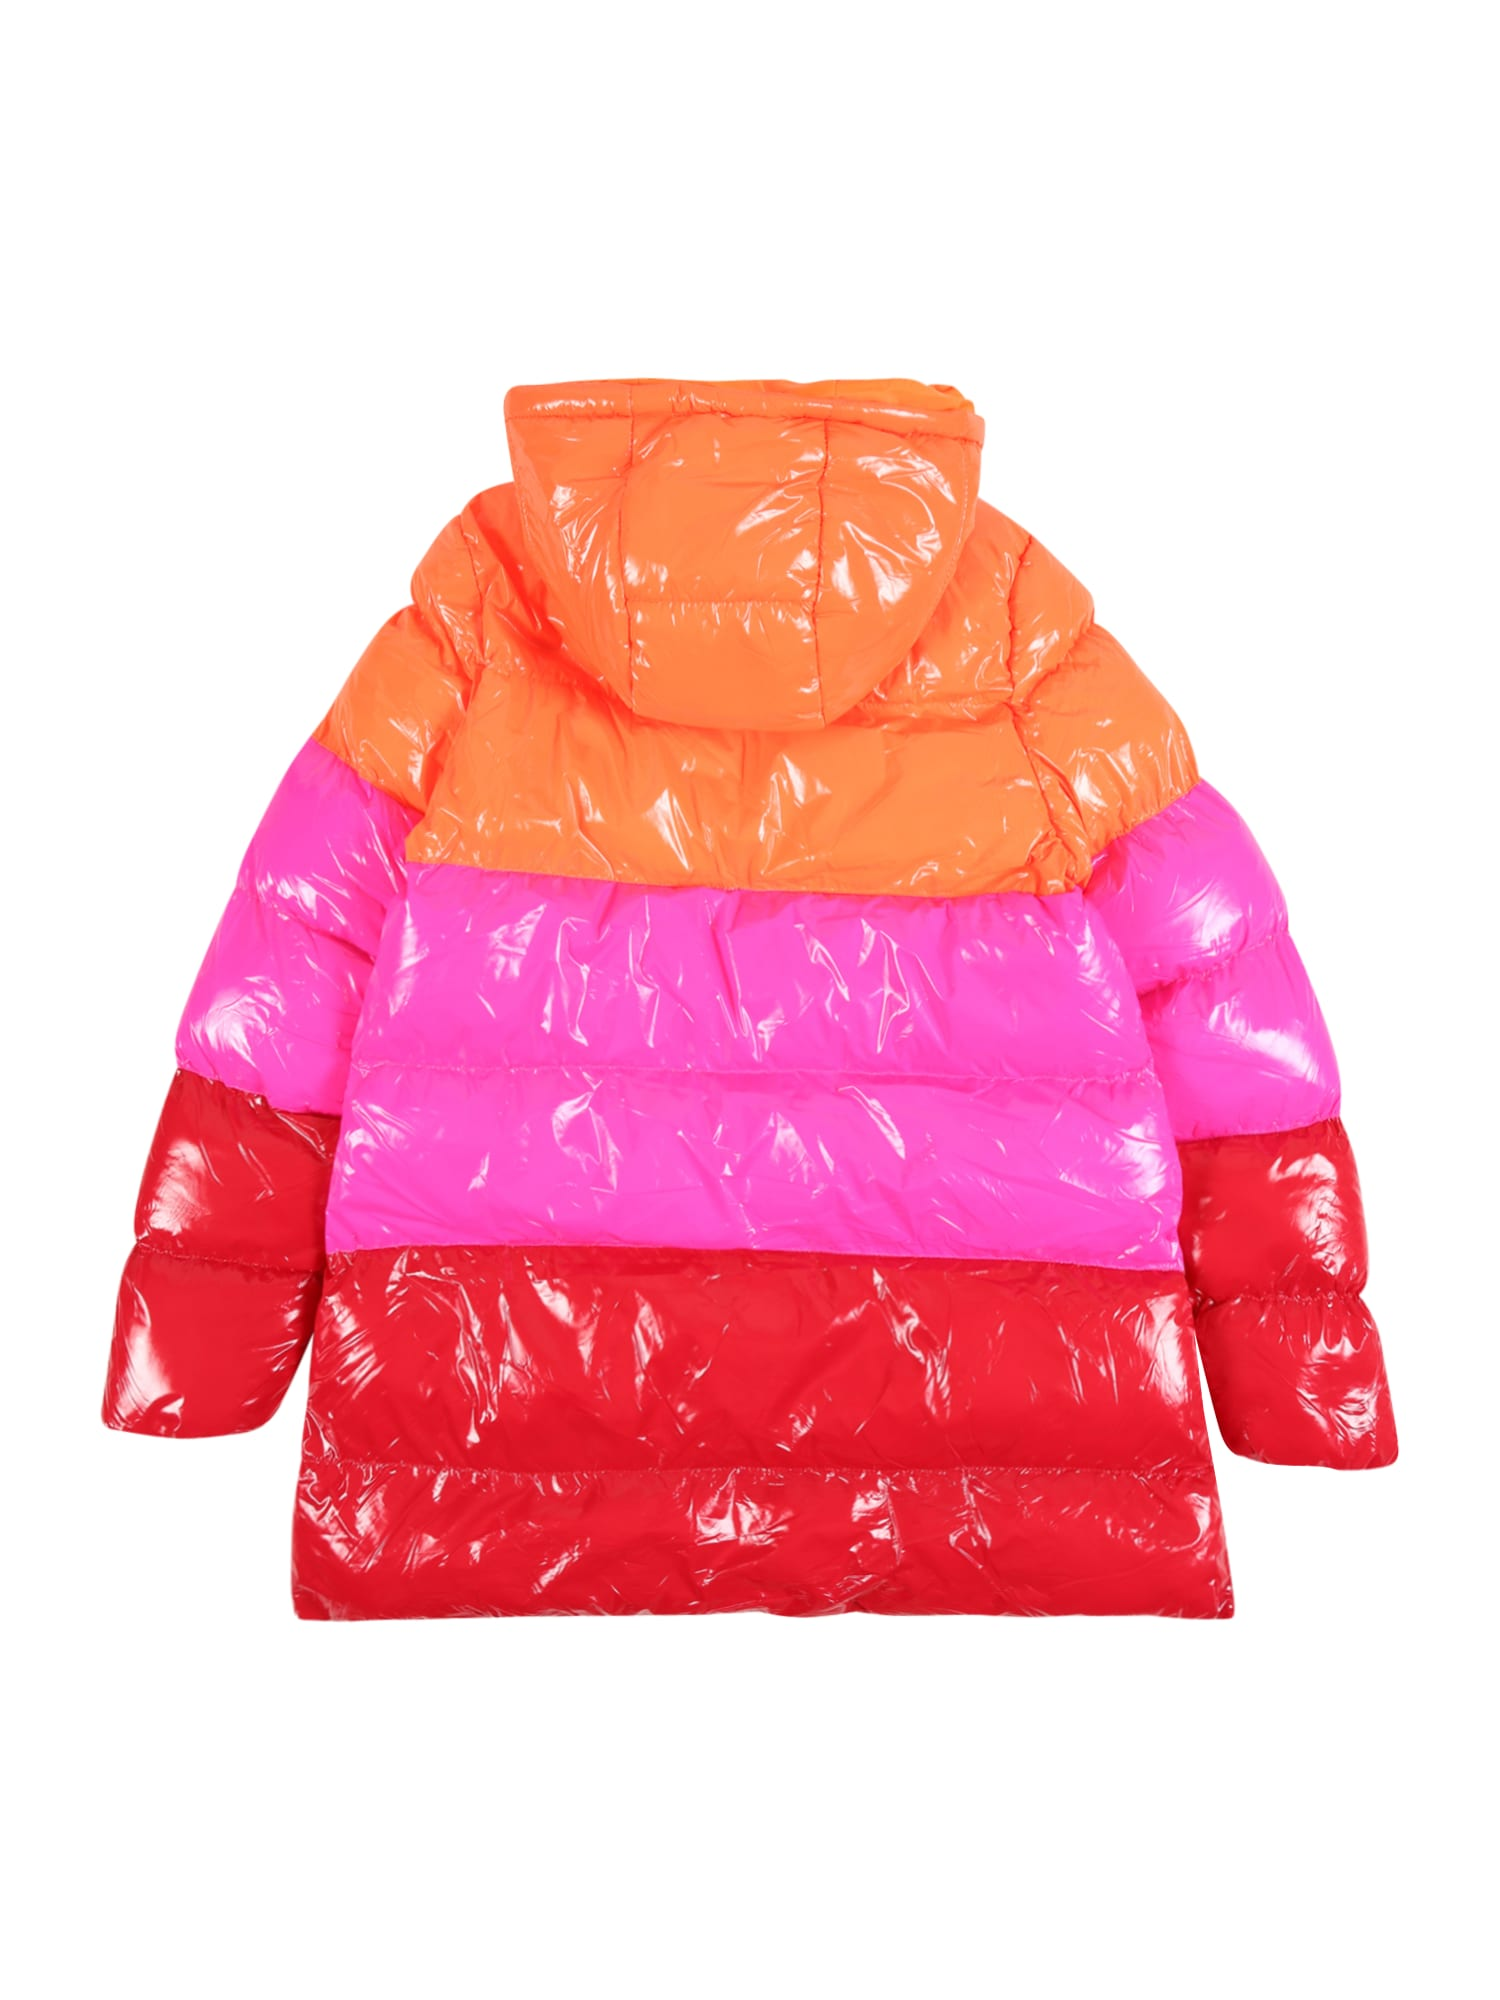 4F Outdoorjacka  orangeröd / knallröd / rosa